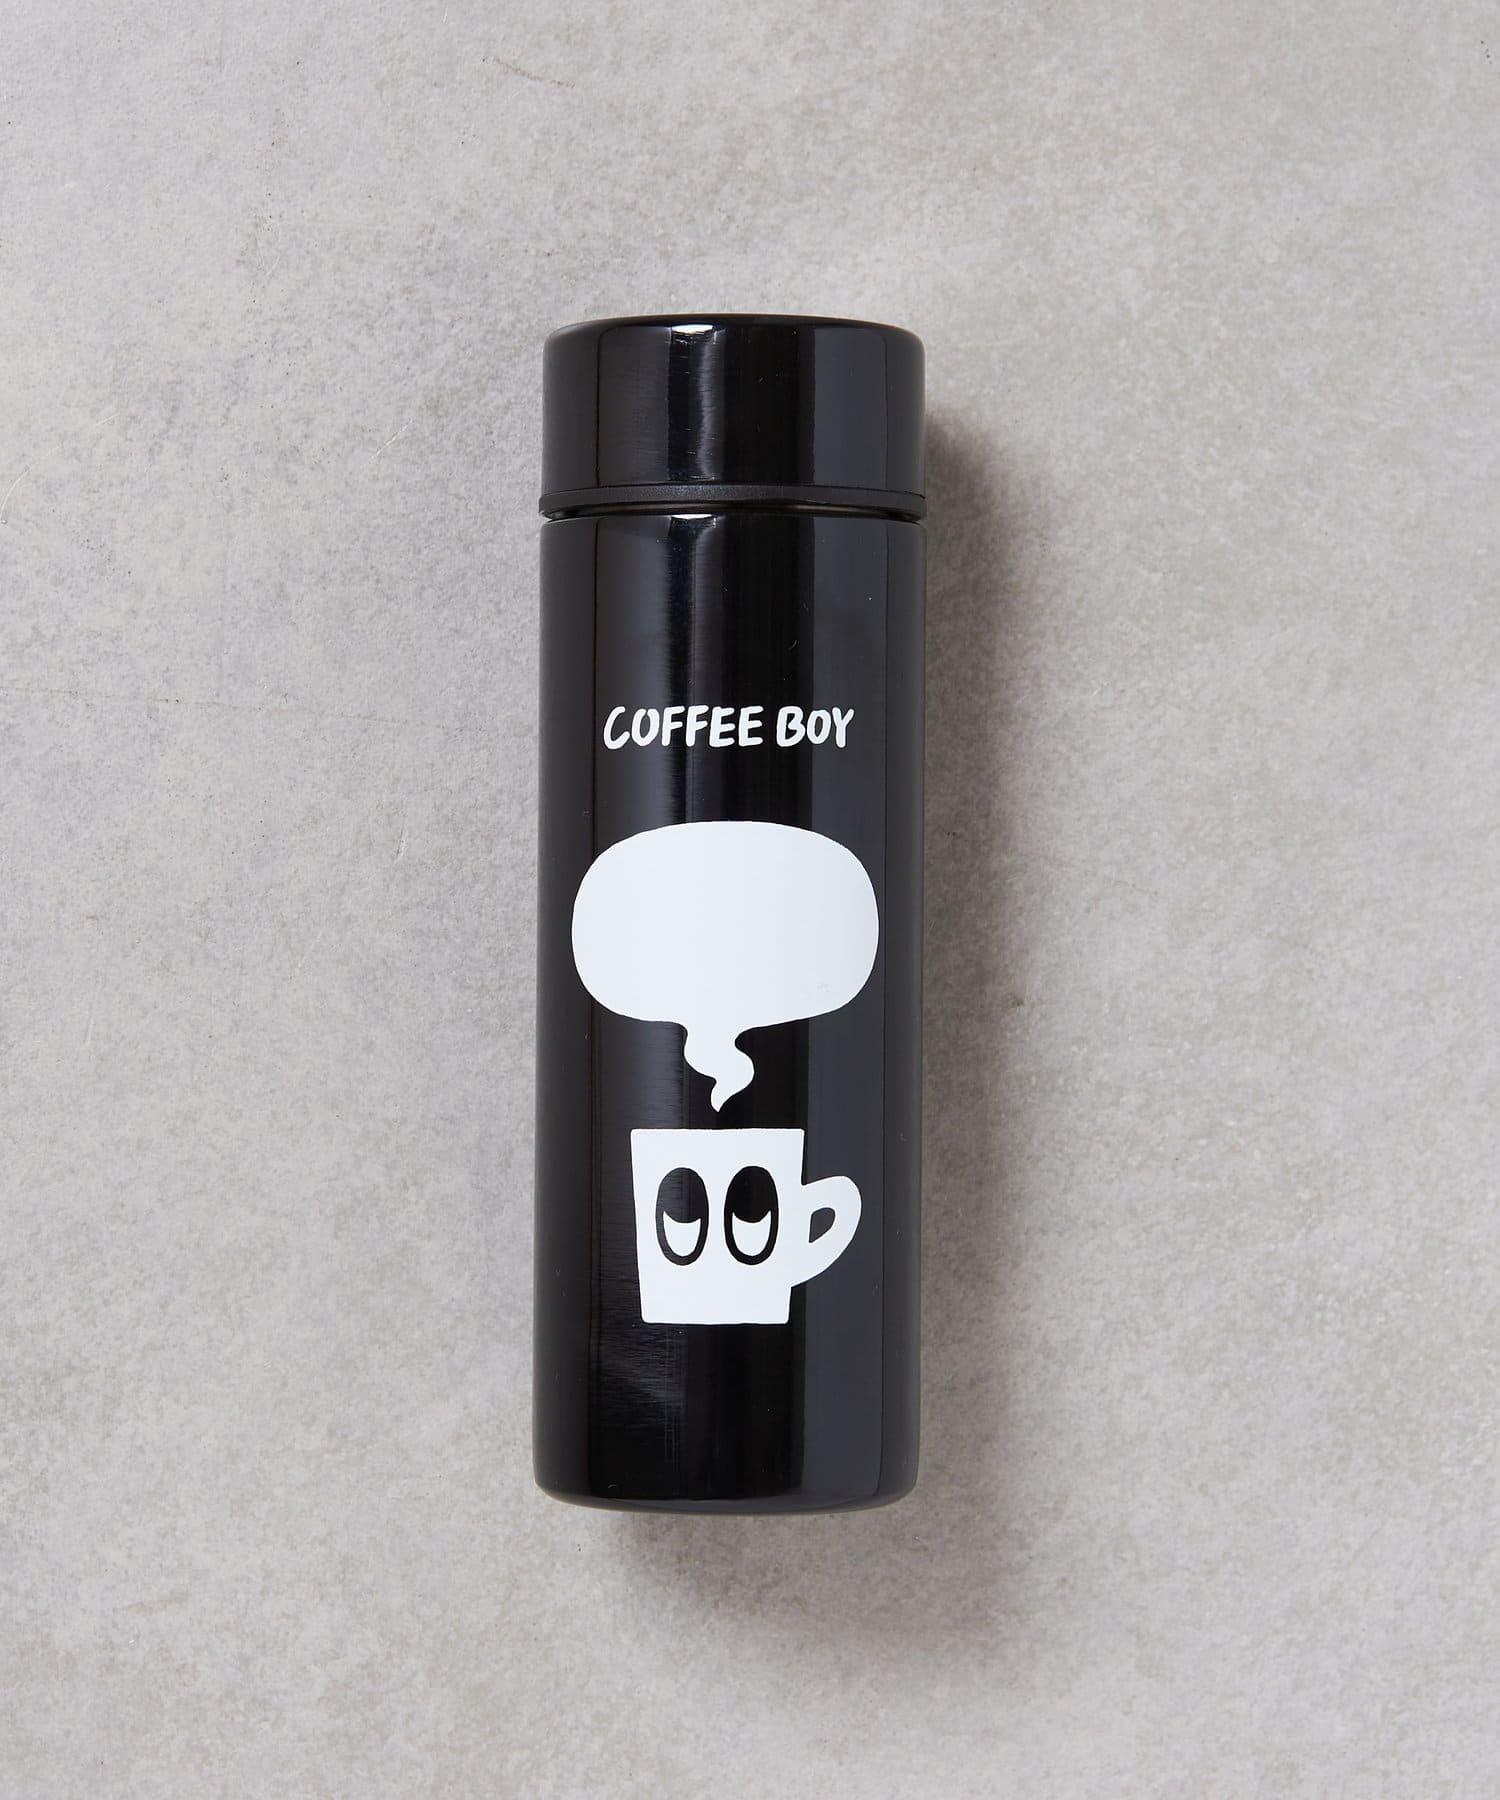 BIRTHDAY BAR(バースデイバー) COFFEE BOY スレンダーボトル / 水筒